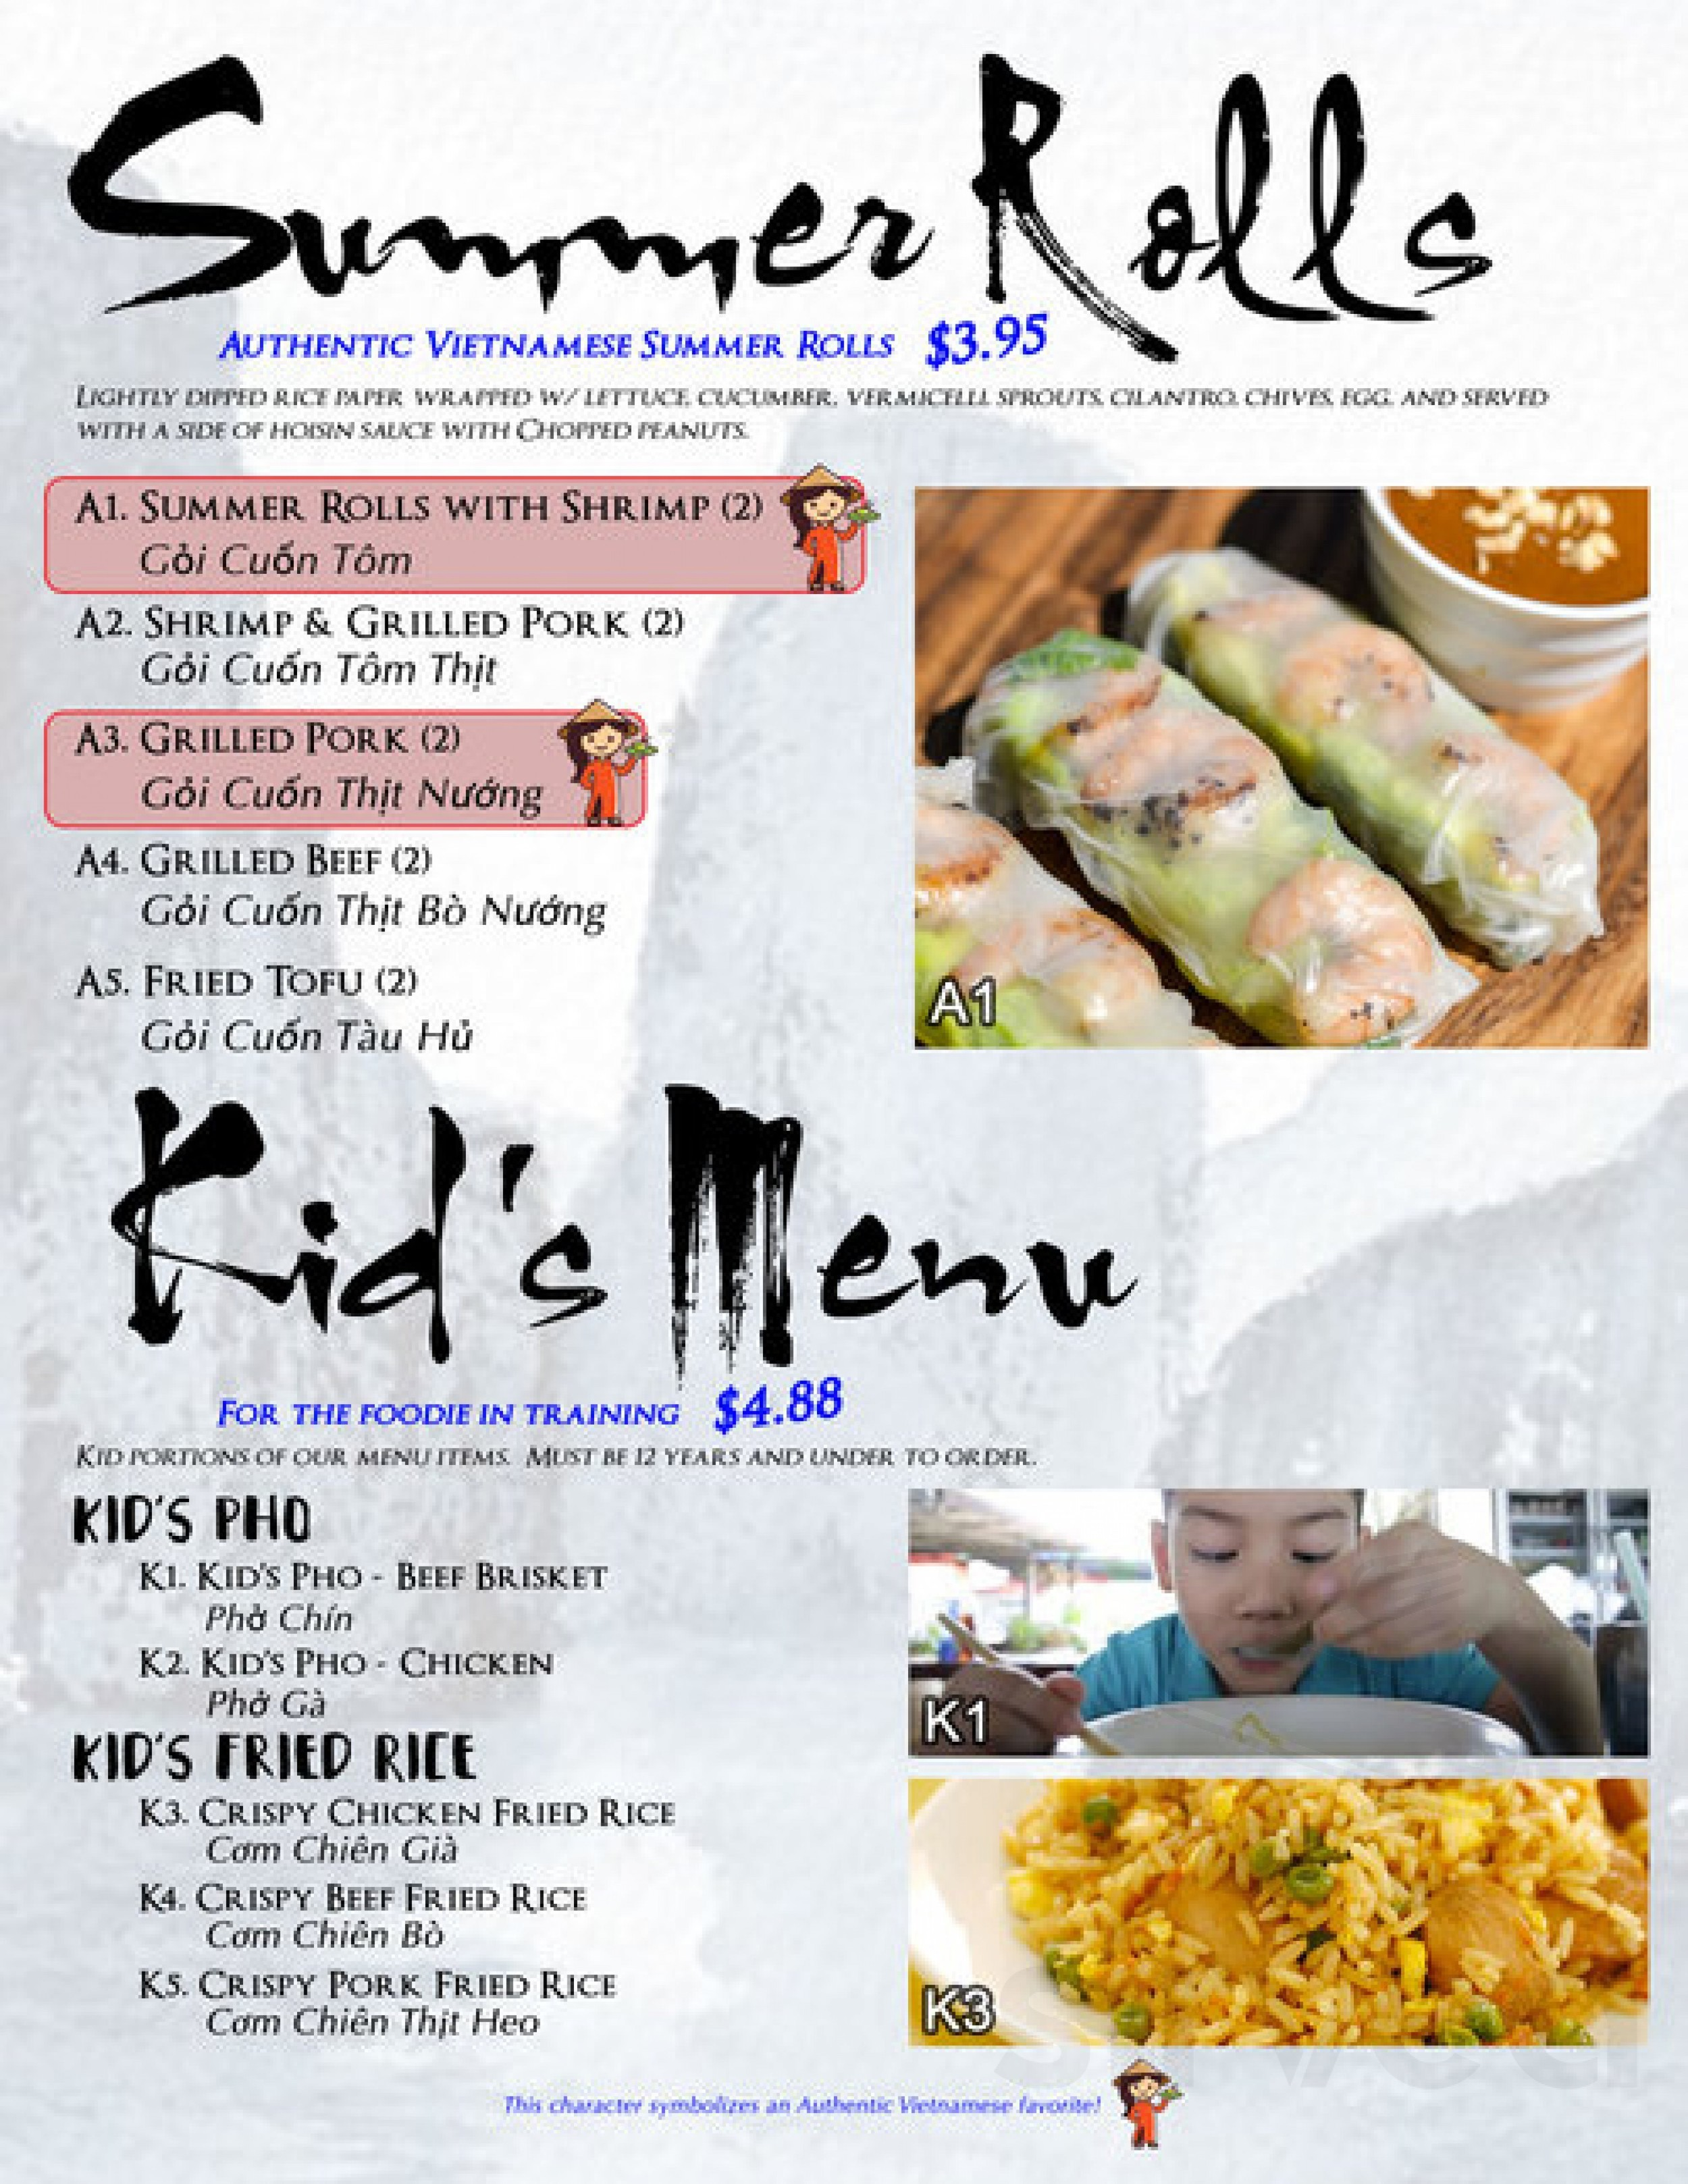 Pho Noodle House & Dragon Wok menu in East Peoria, Illinois